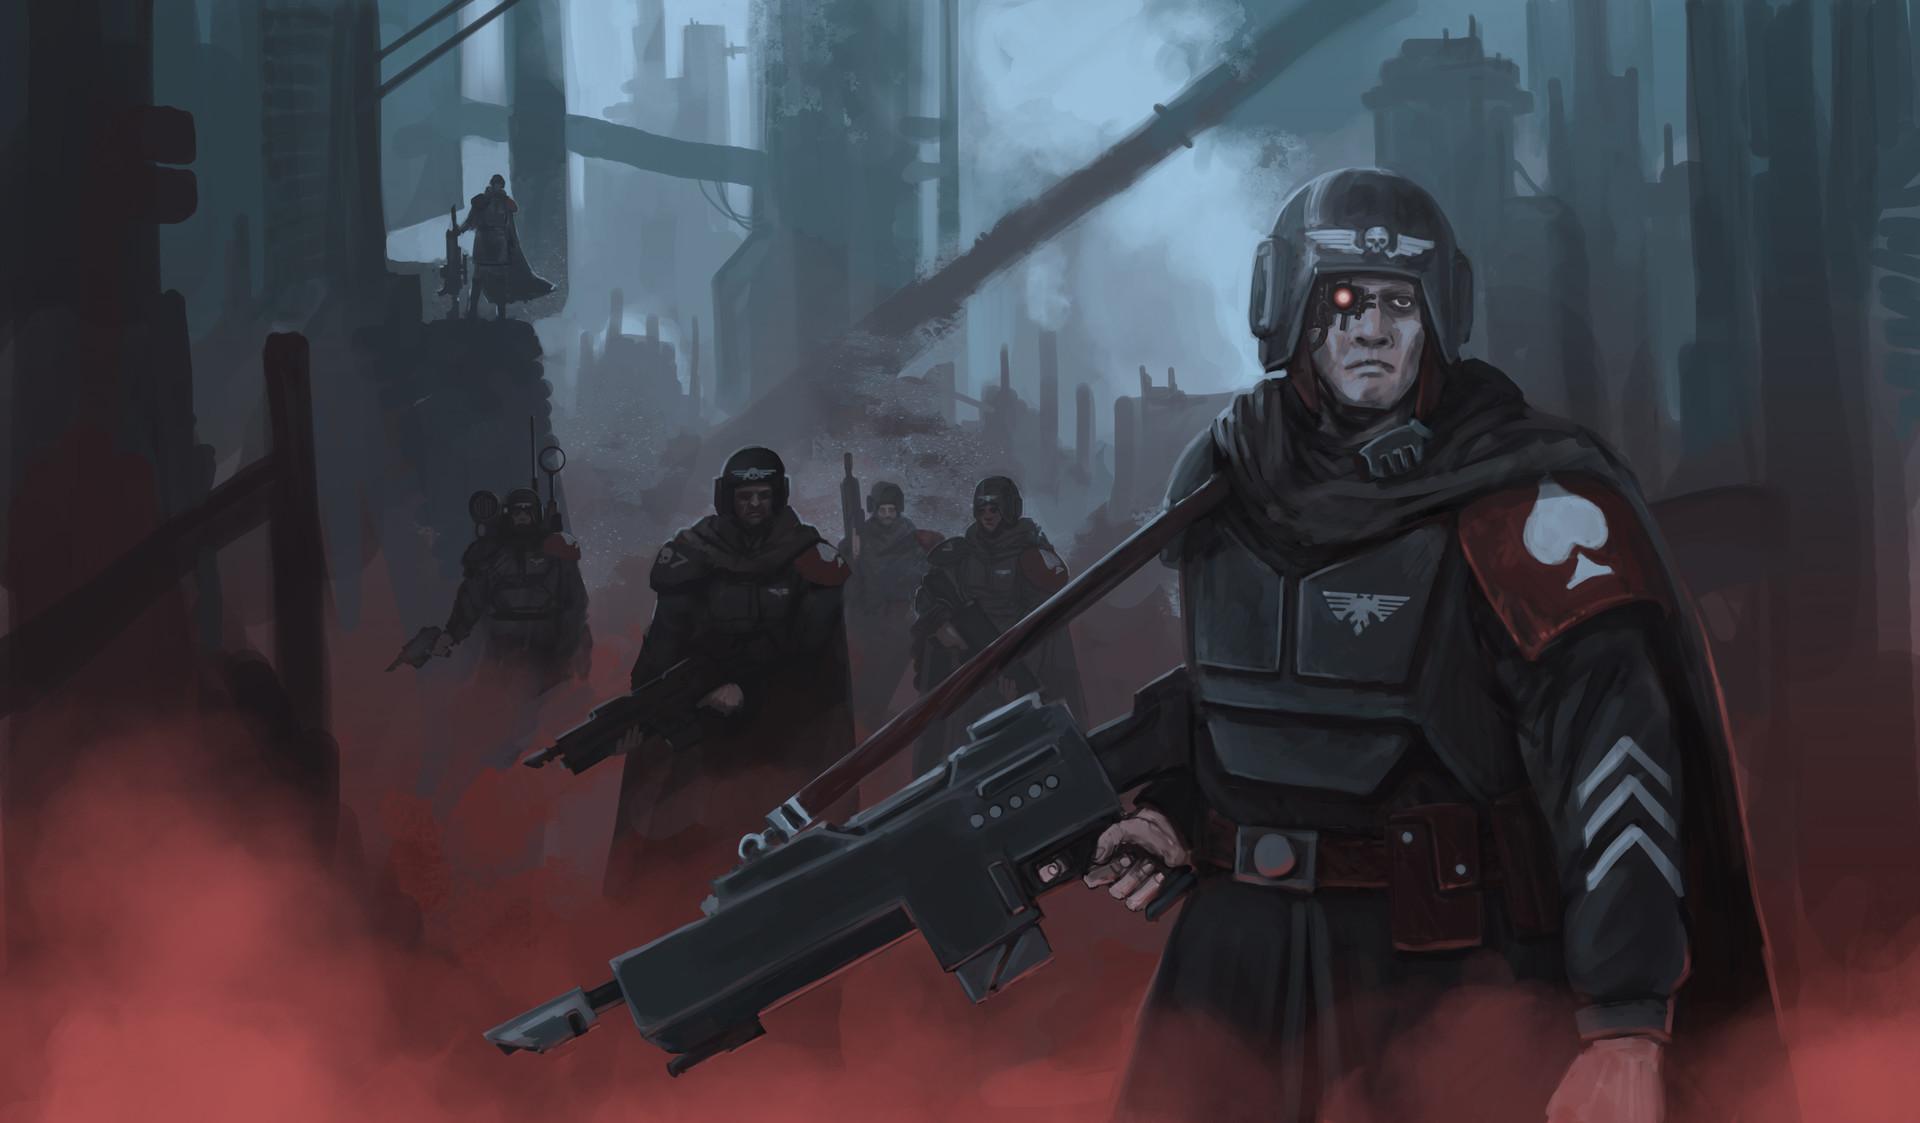 Imperial Guard Killteam by Samuel Allan [xpost from /r